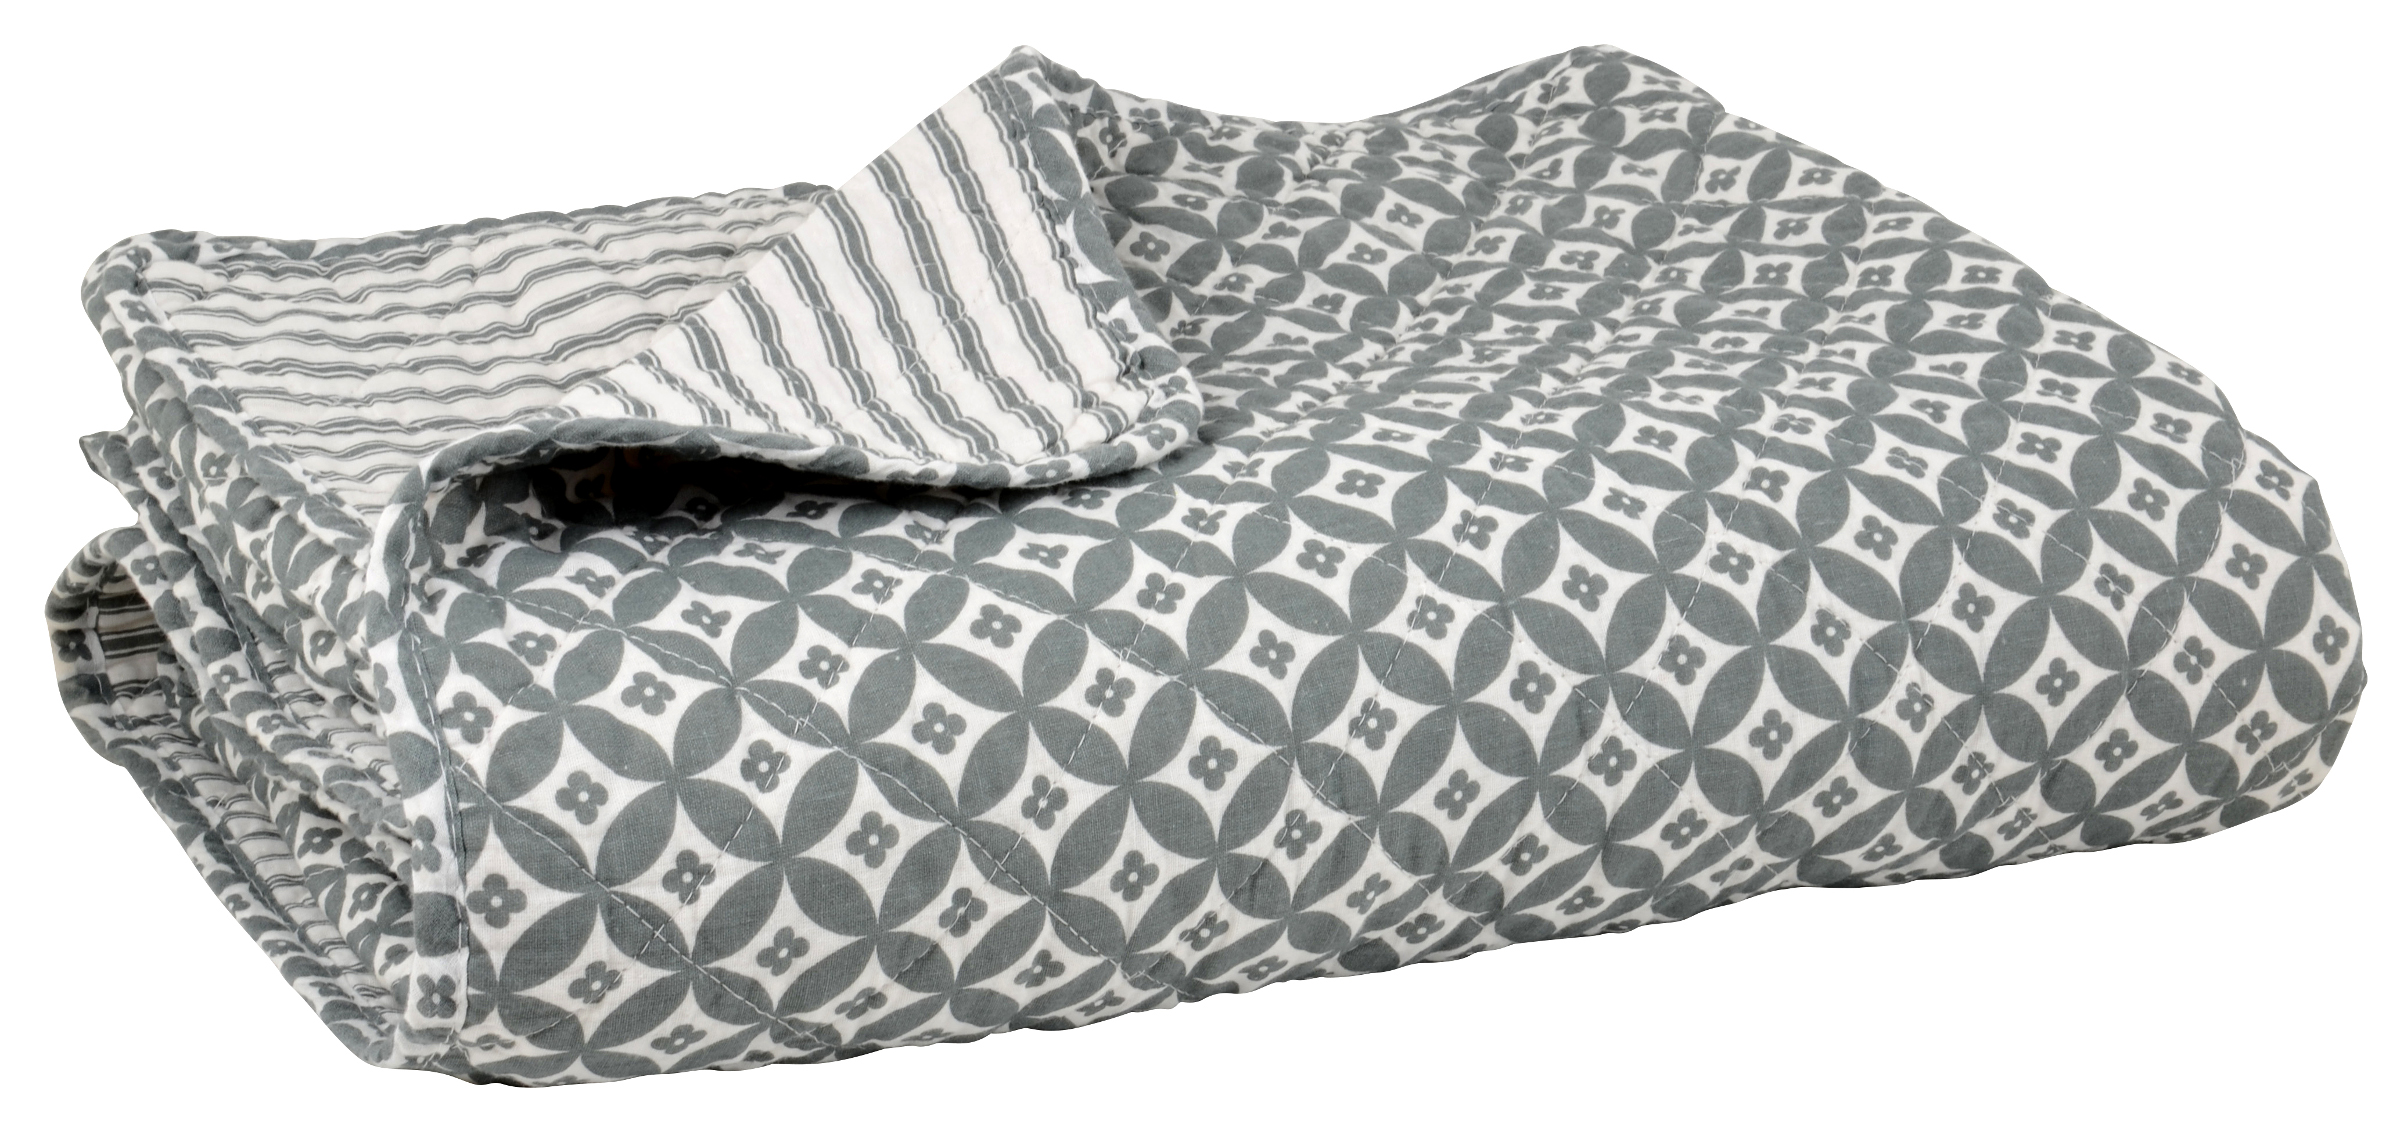 ib laursen tagesdecke esther grau 130 x 180 cm quilt. Black Bedroom Furniture Sets. Home Design Ideas